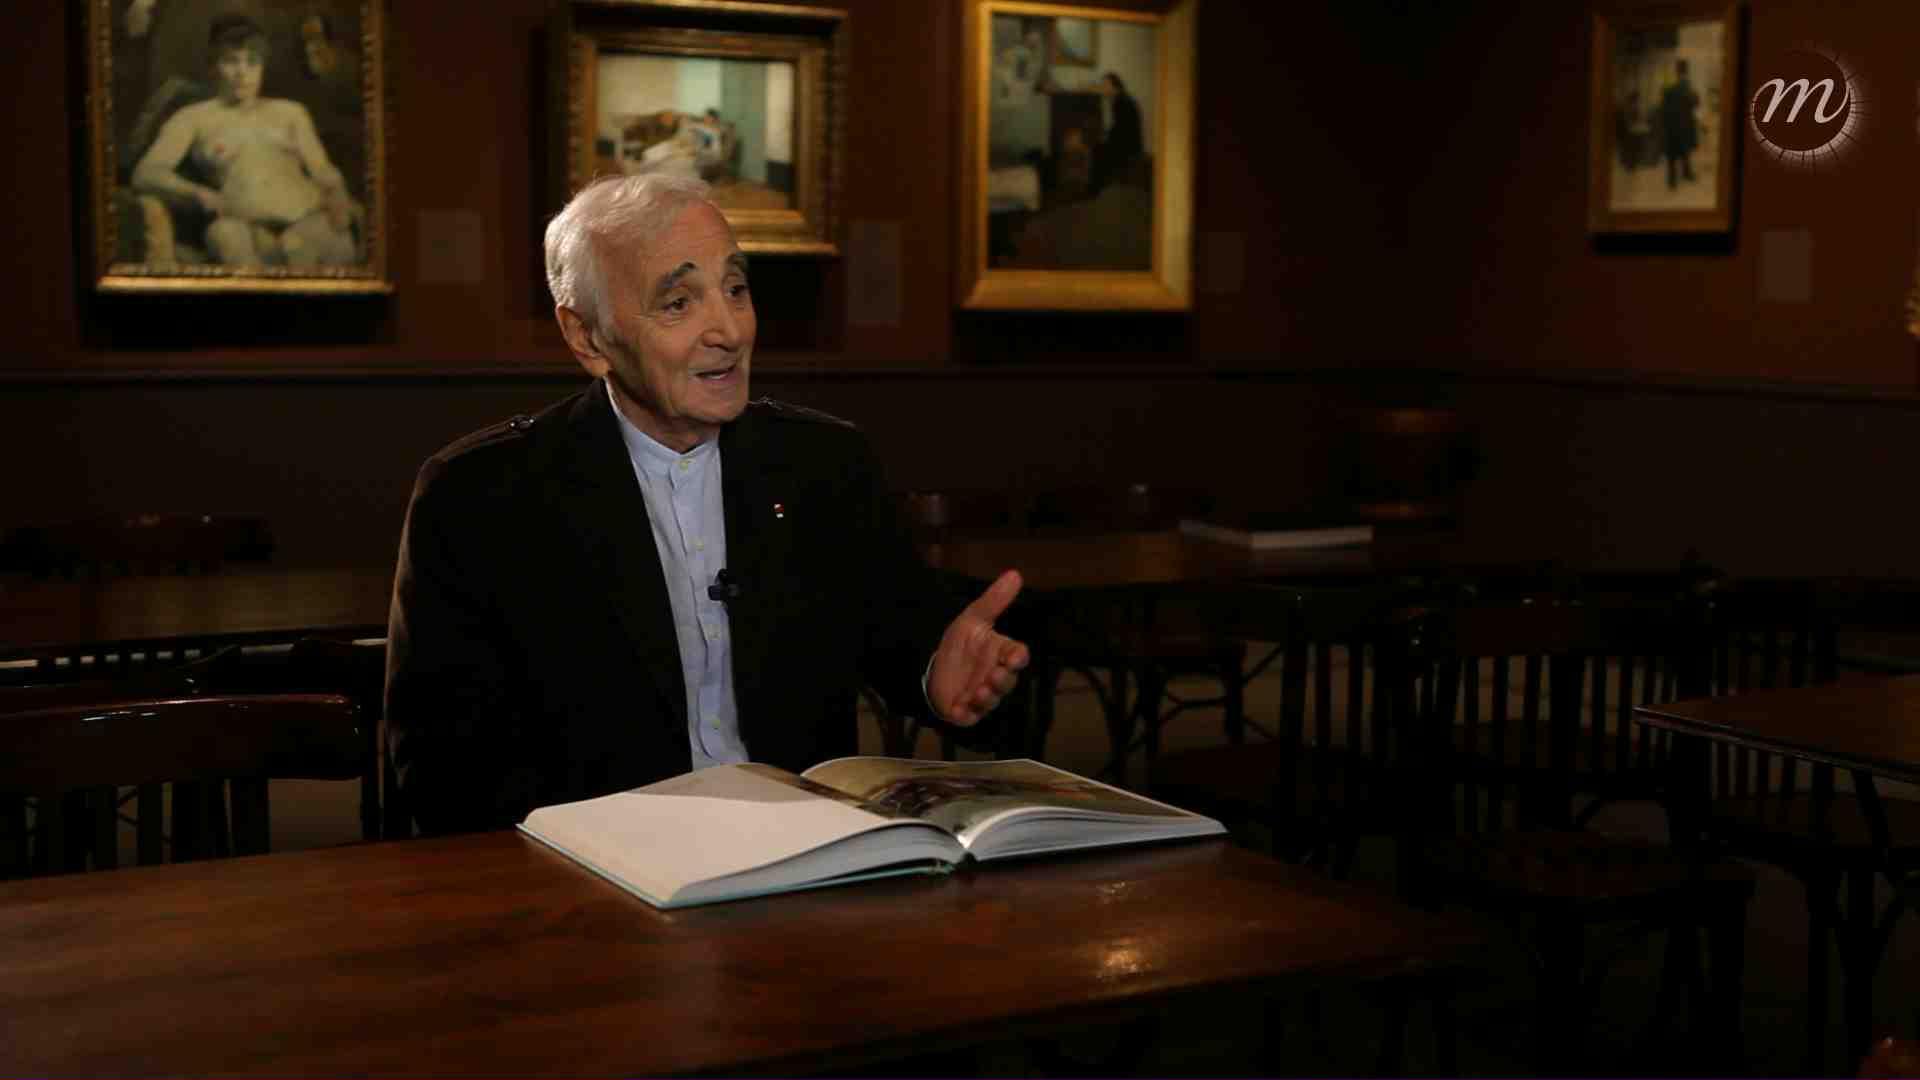 Rencontre avec Charles Aznavour